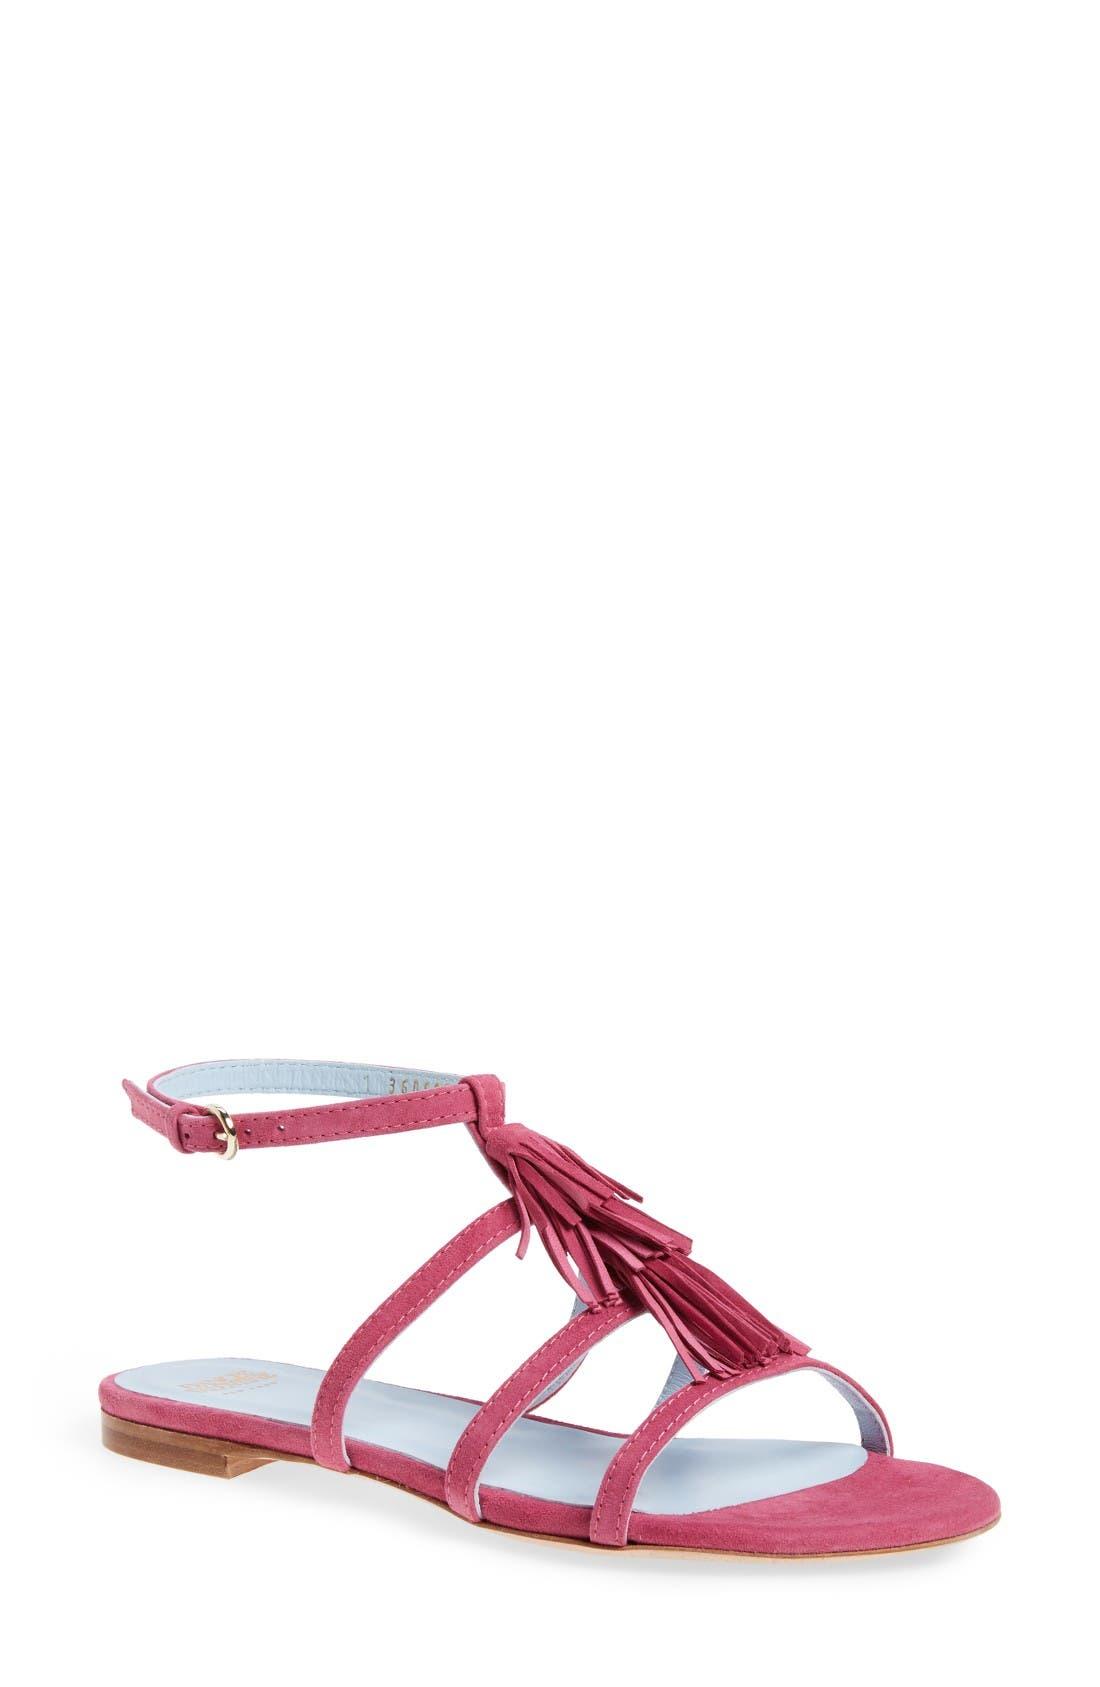 Frances Valentine Mia Tassel Ankle Strap Sandal (Women)